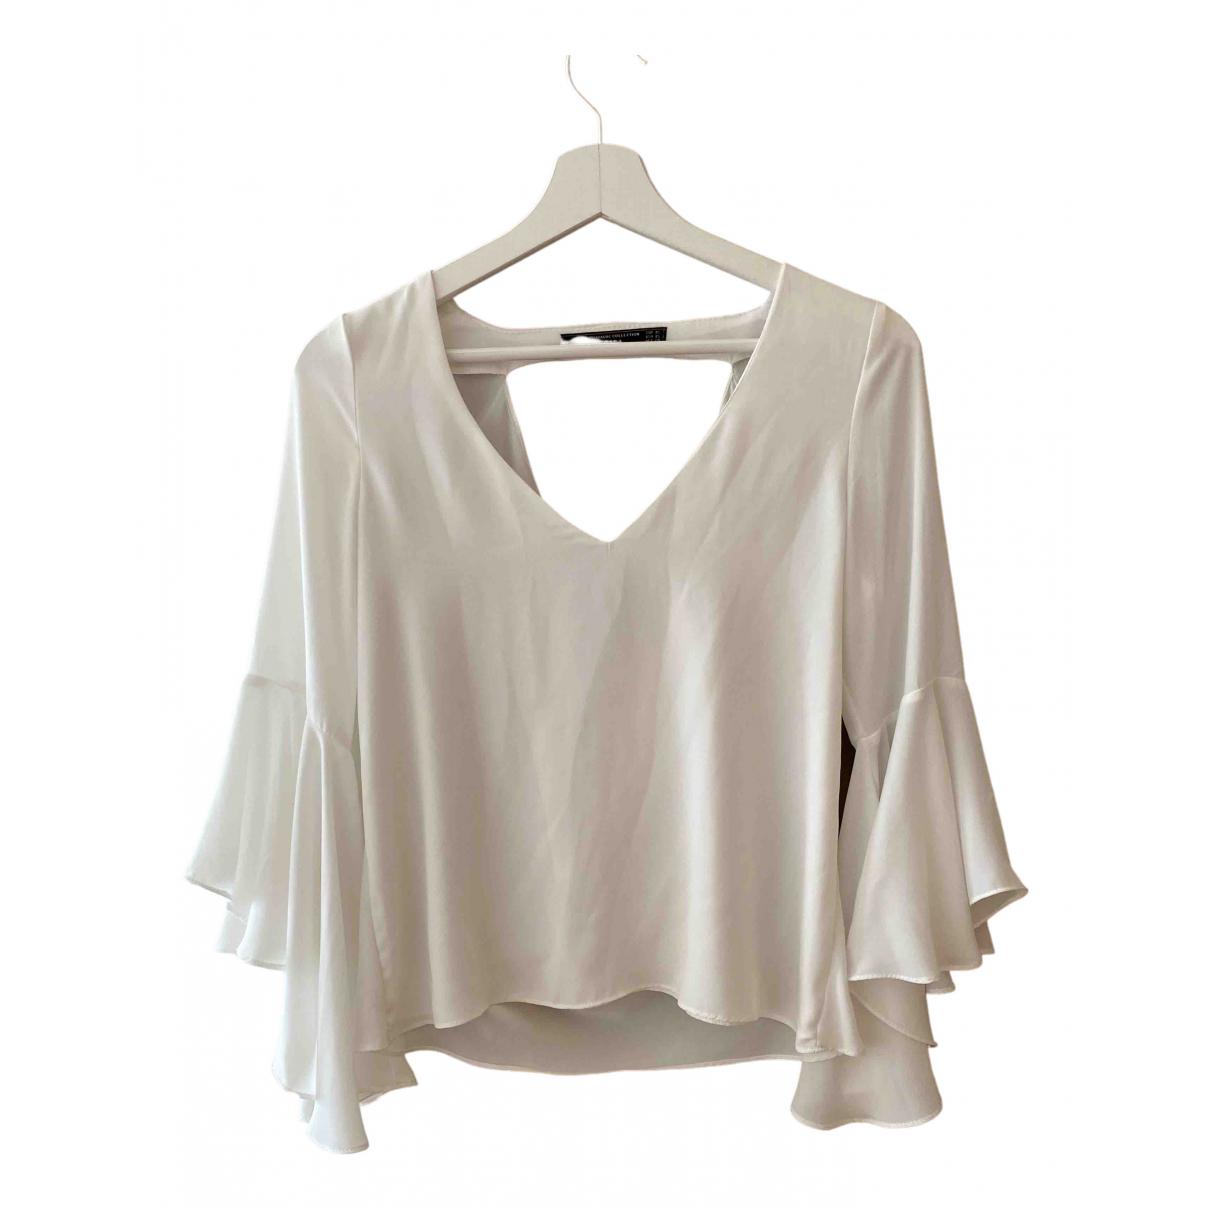 Zara \N White  top for Women XS International